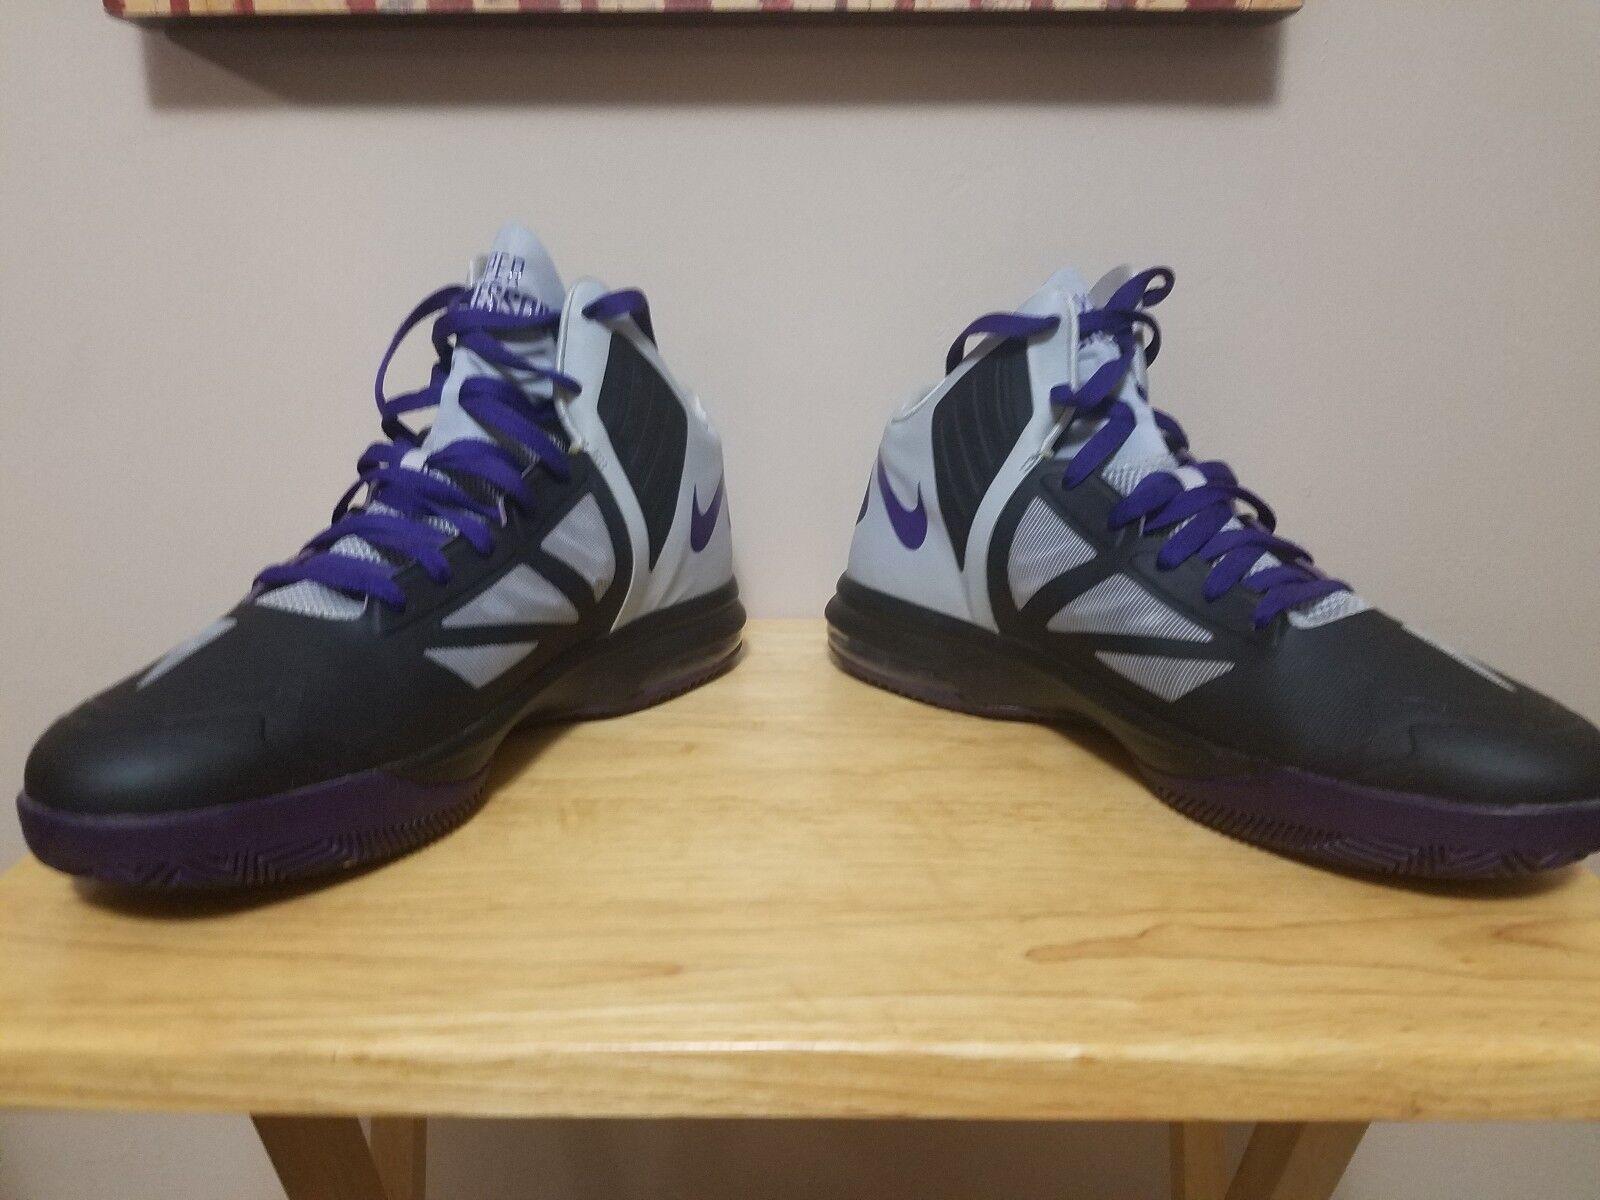 Rare 2013 Mens Nike HYPER Aggressor 524851-010 Size 12 Purple/Black Tennis Shoes